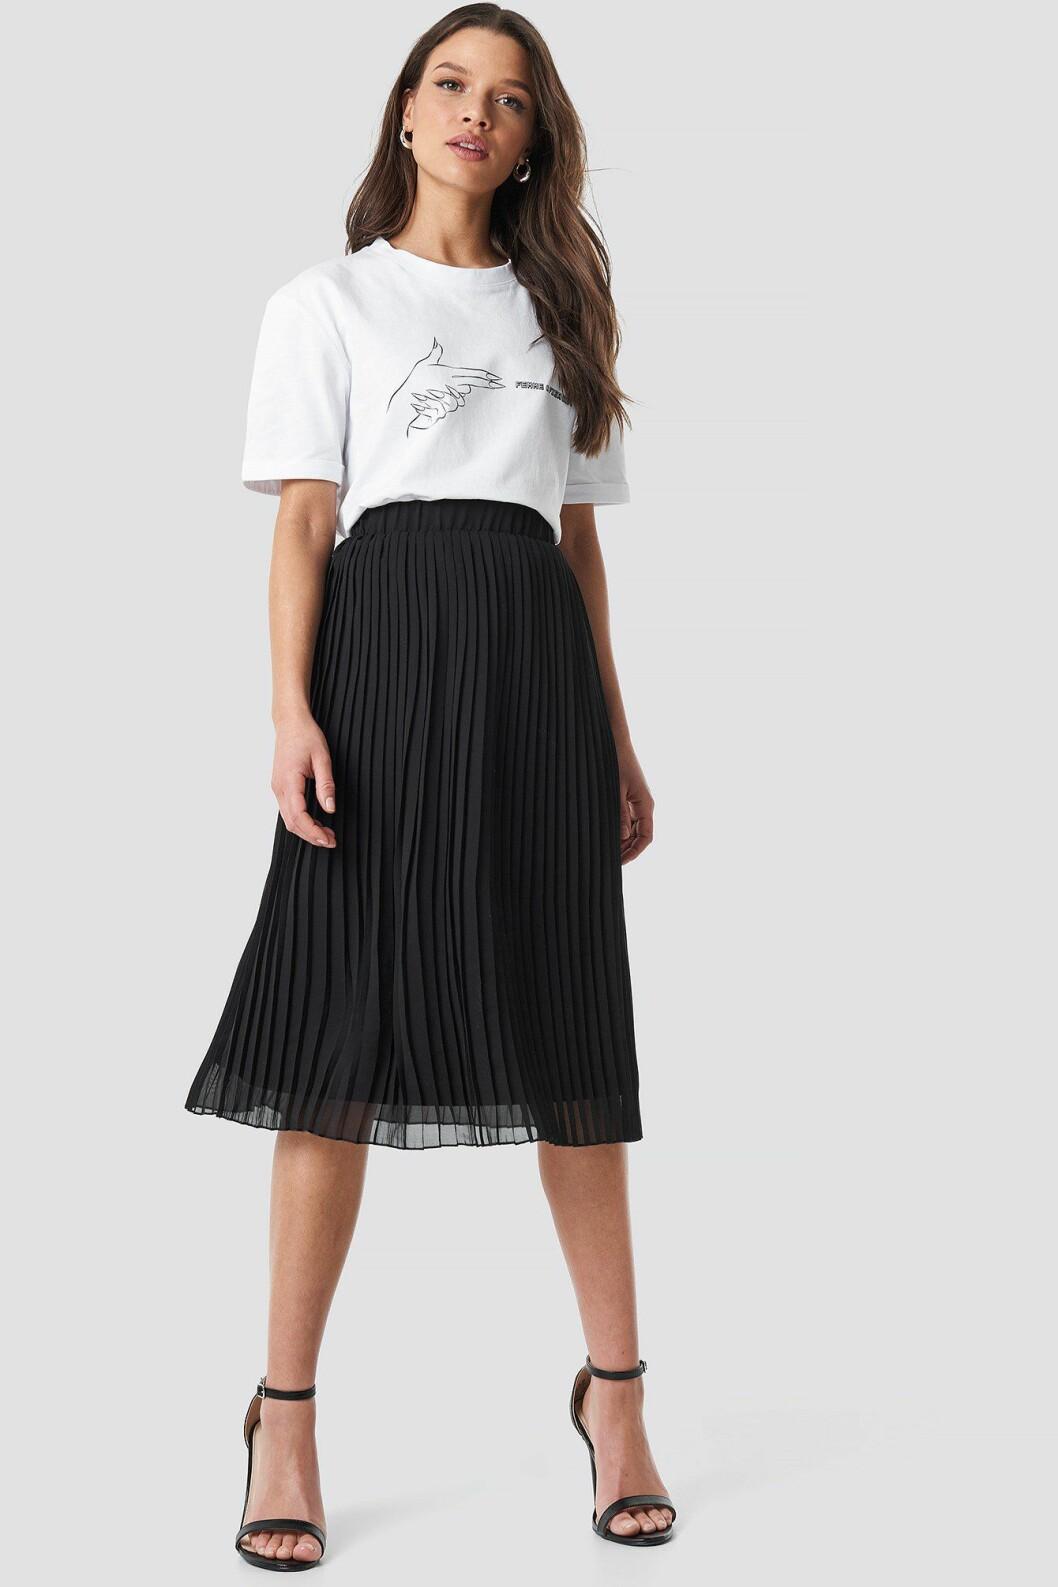 Linn Ahlborg Na-kd plisserad kjol